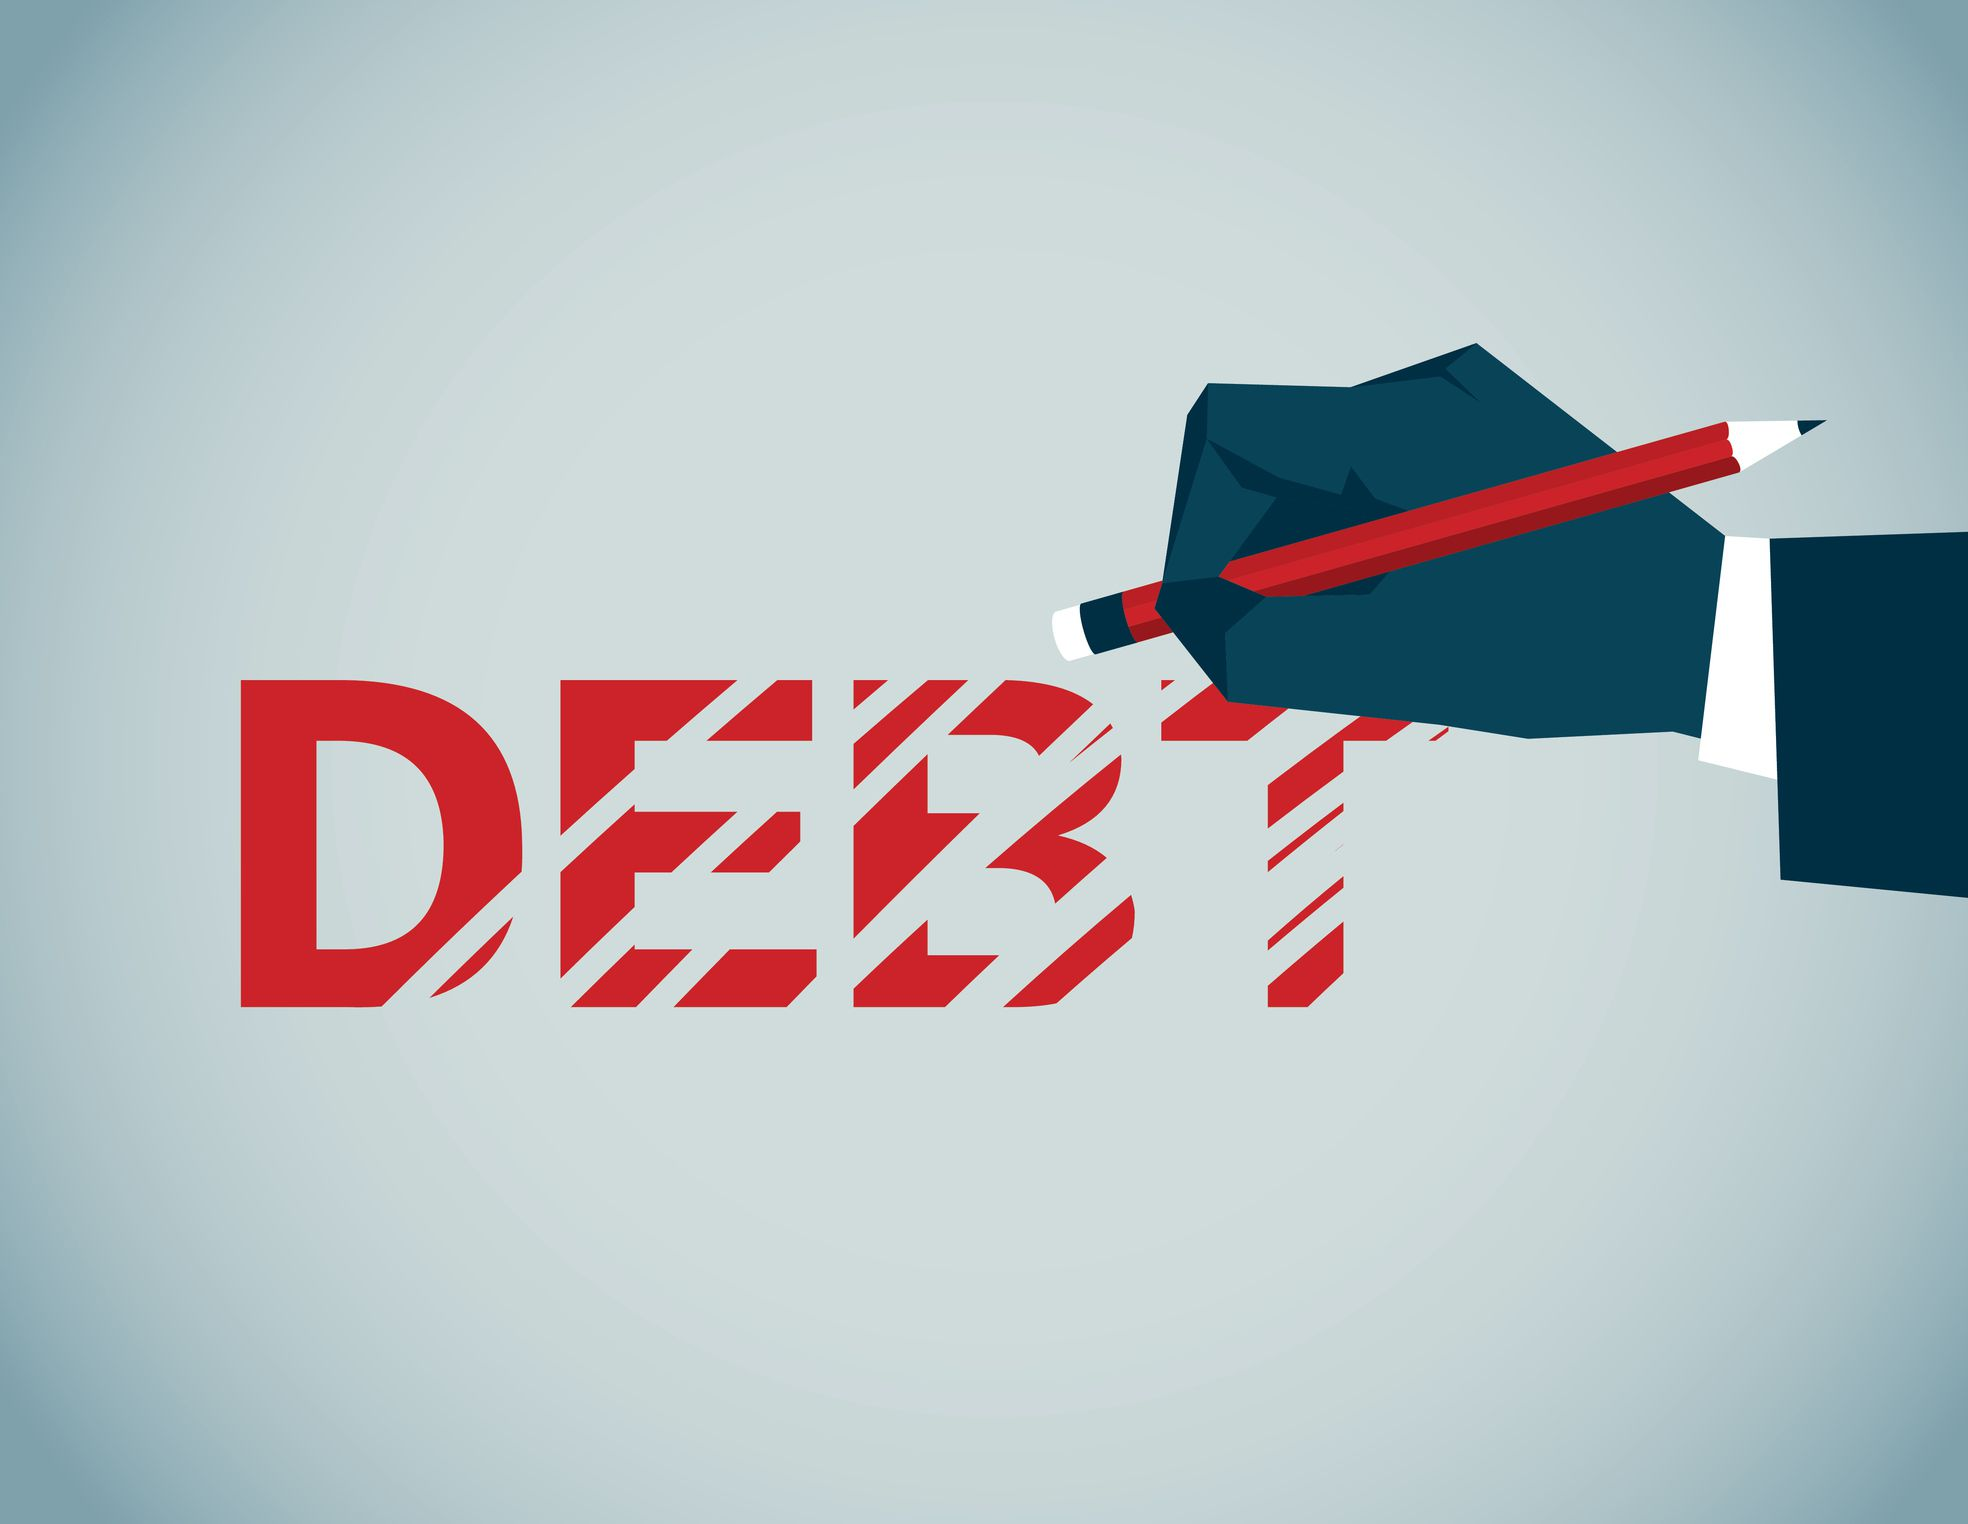 Budget advisor - is credit card debt settlement effective